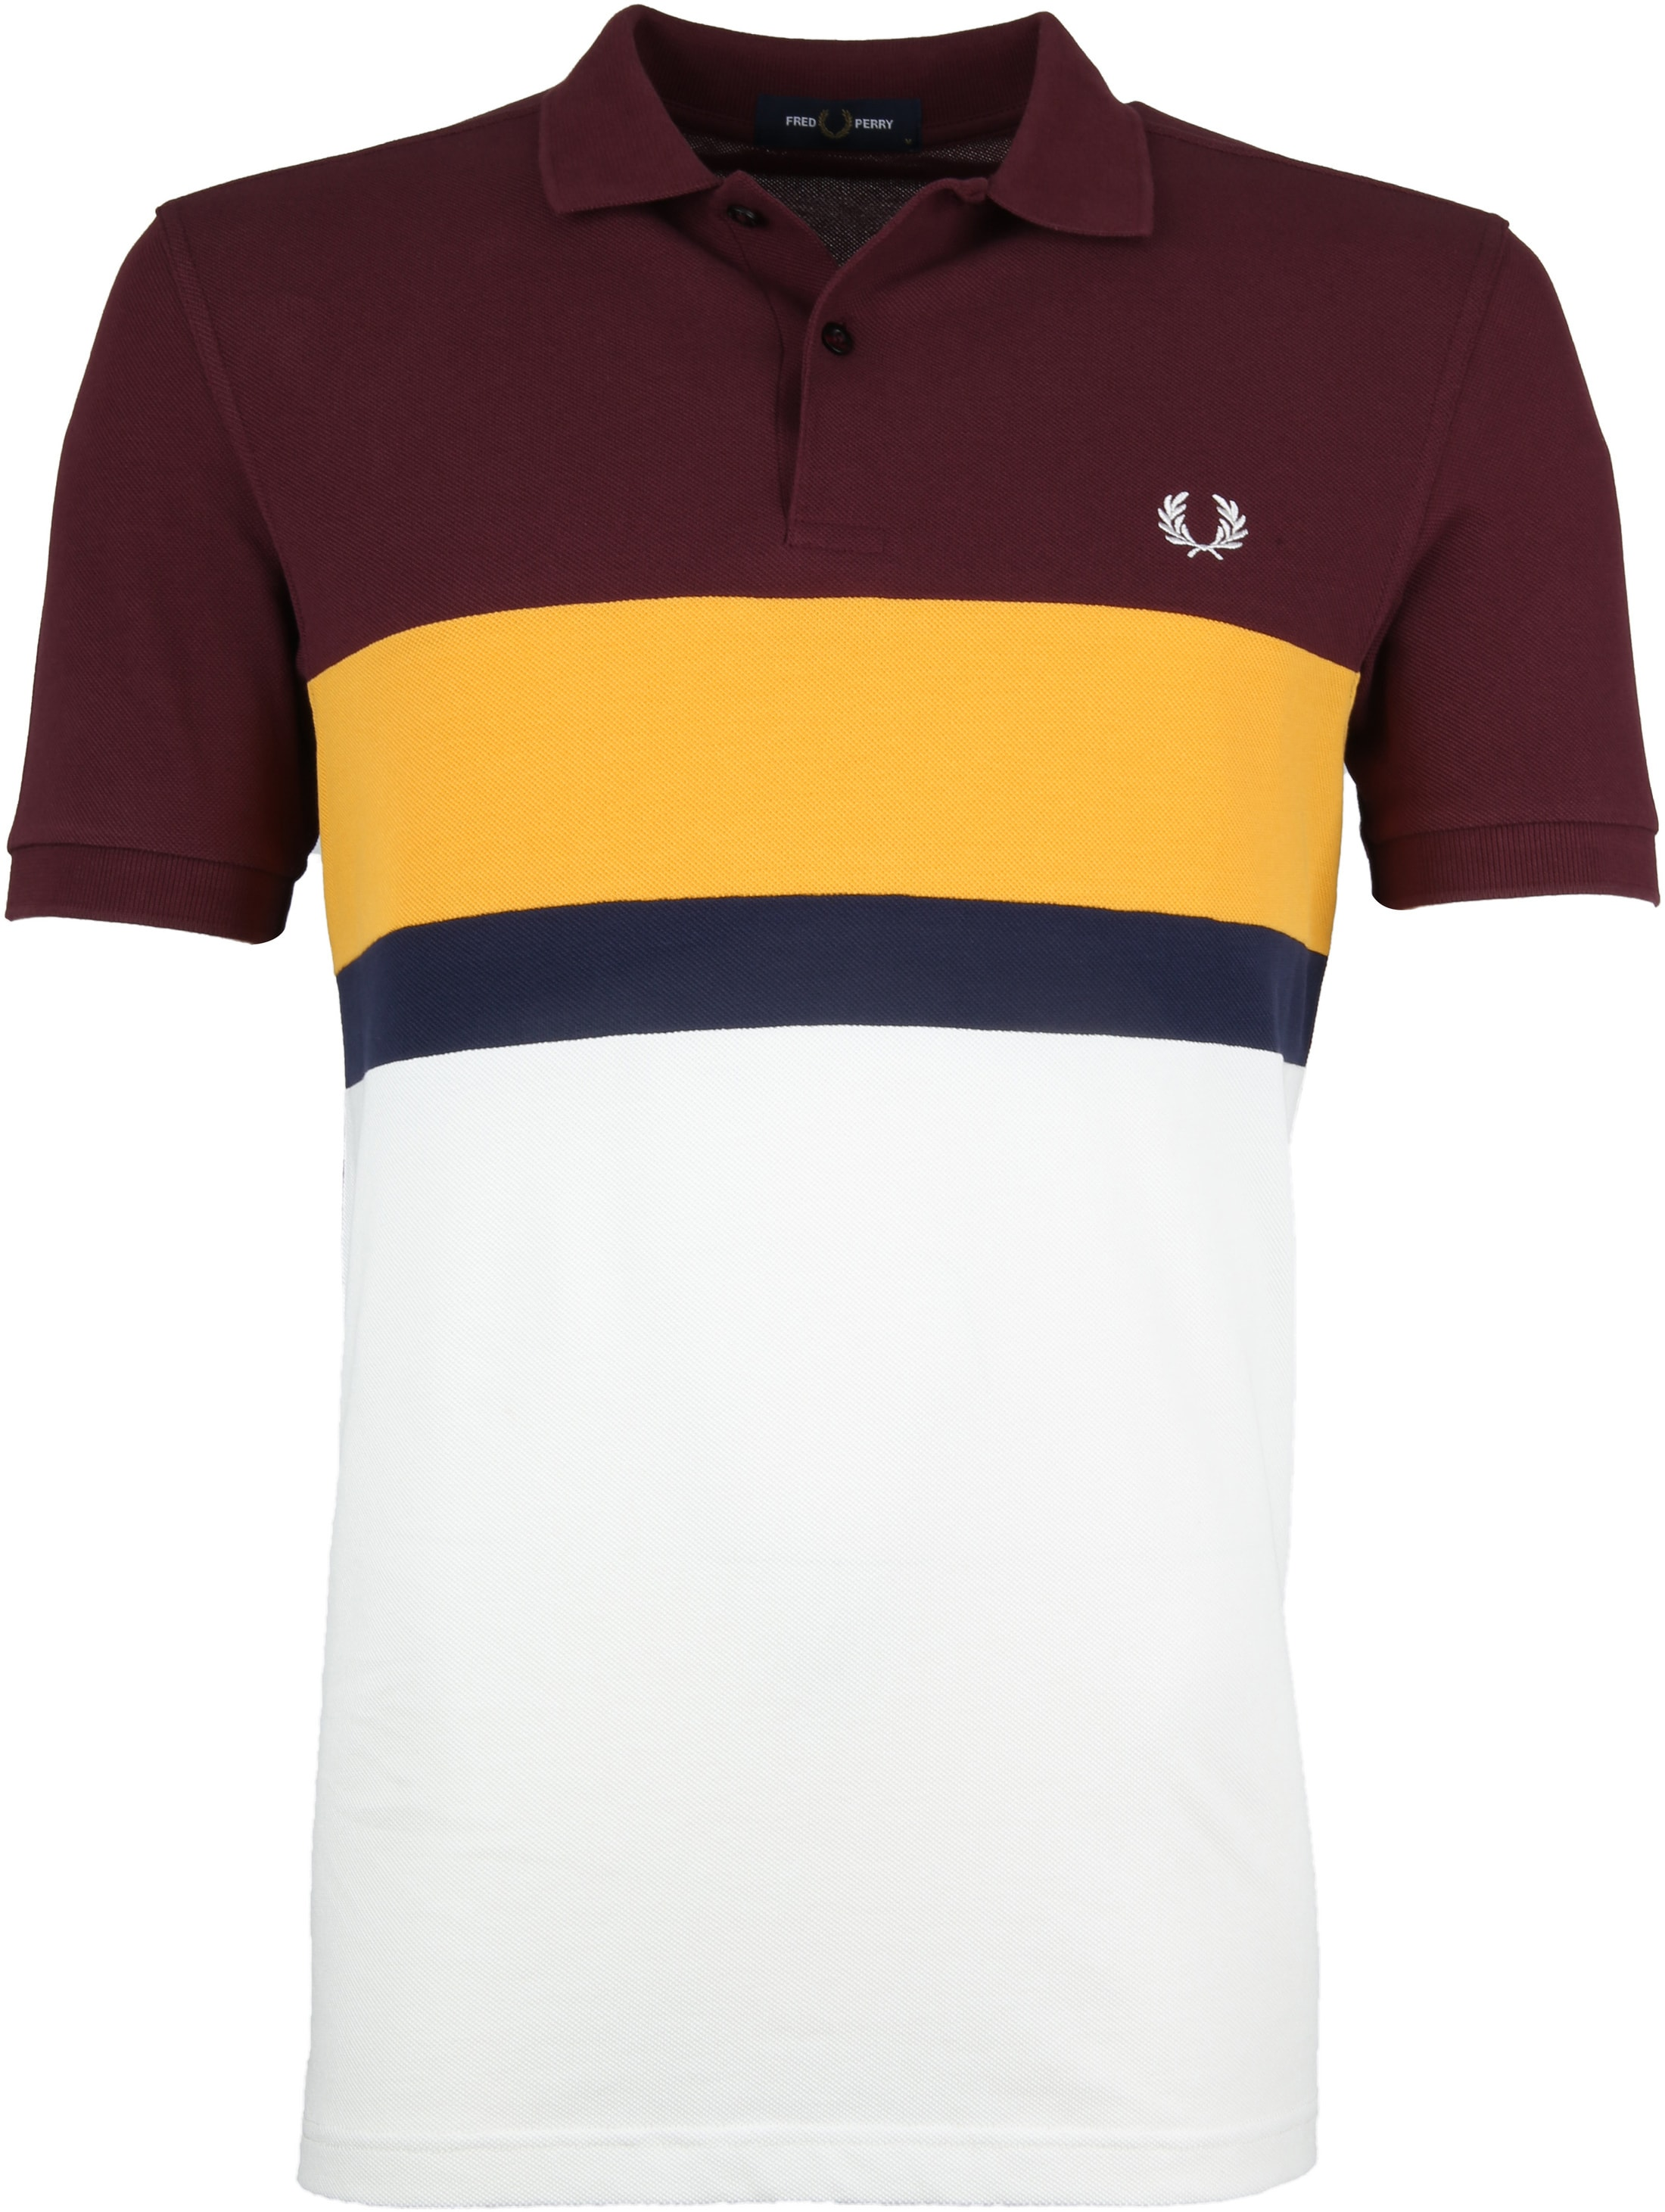 Fred Perry Polo Shirt Stripes Mahogany